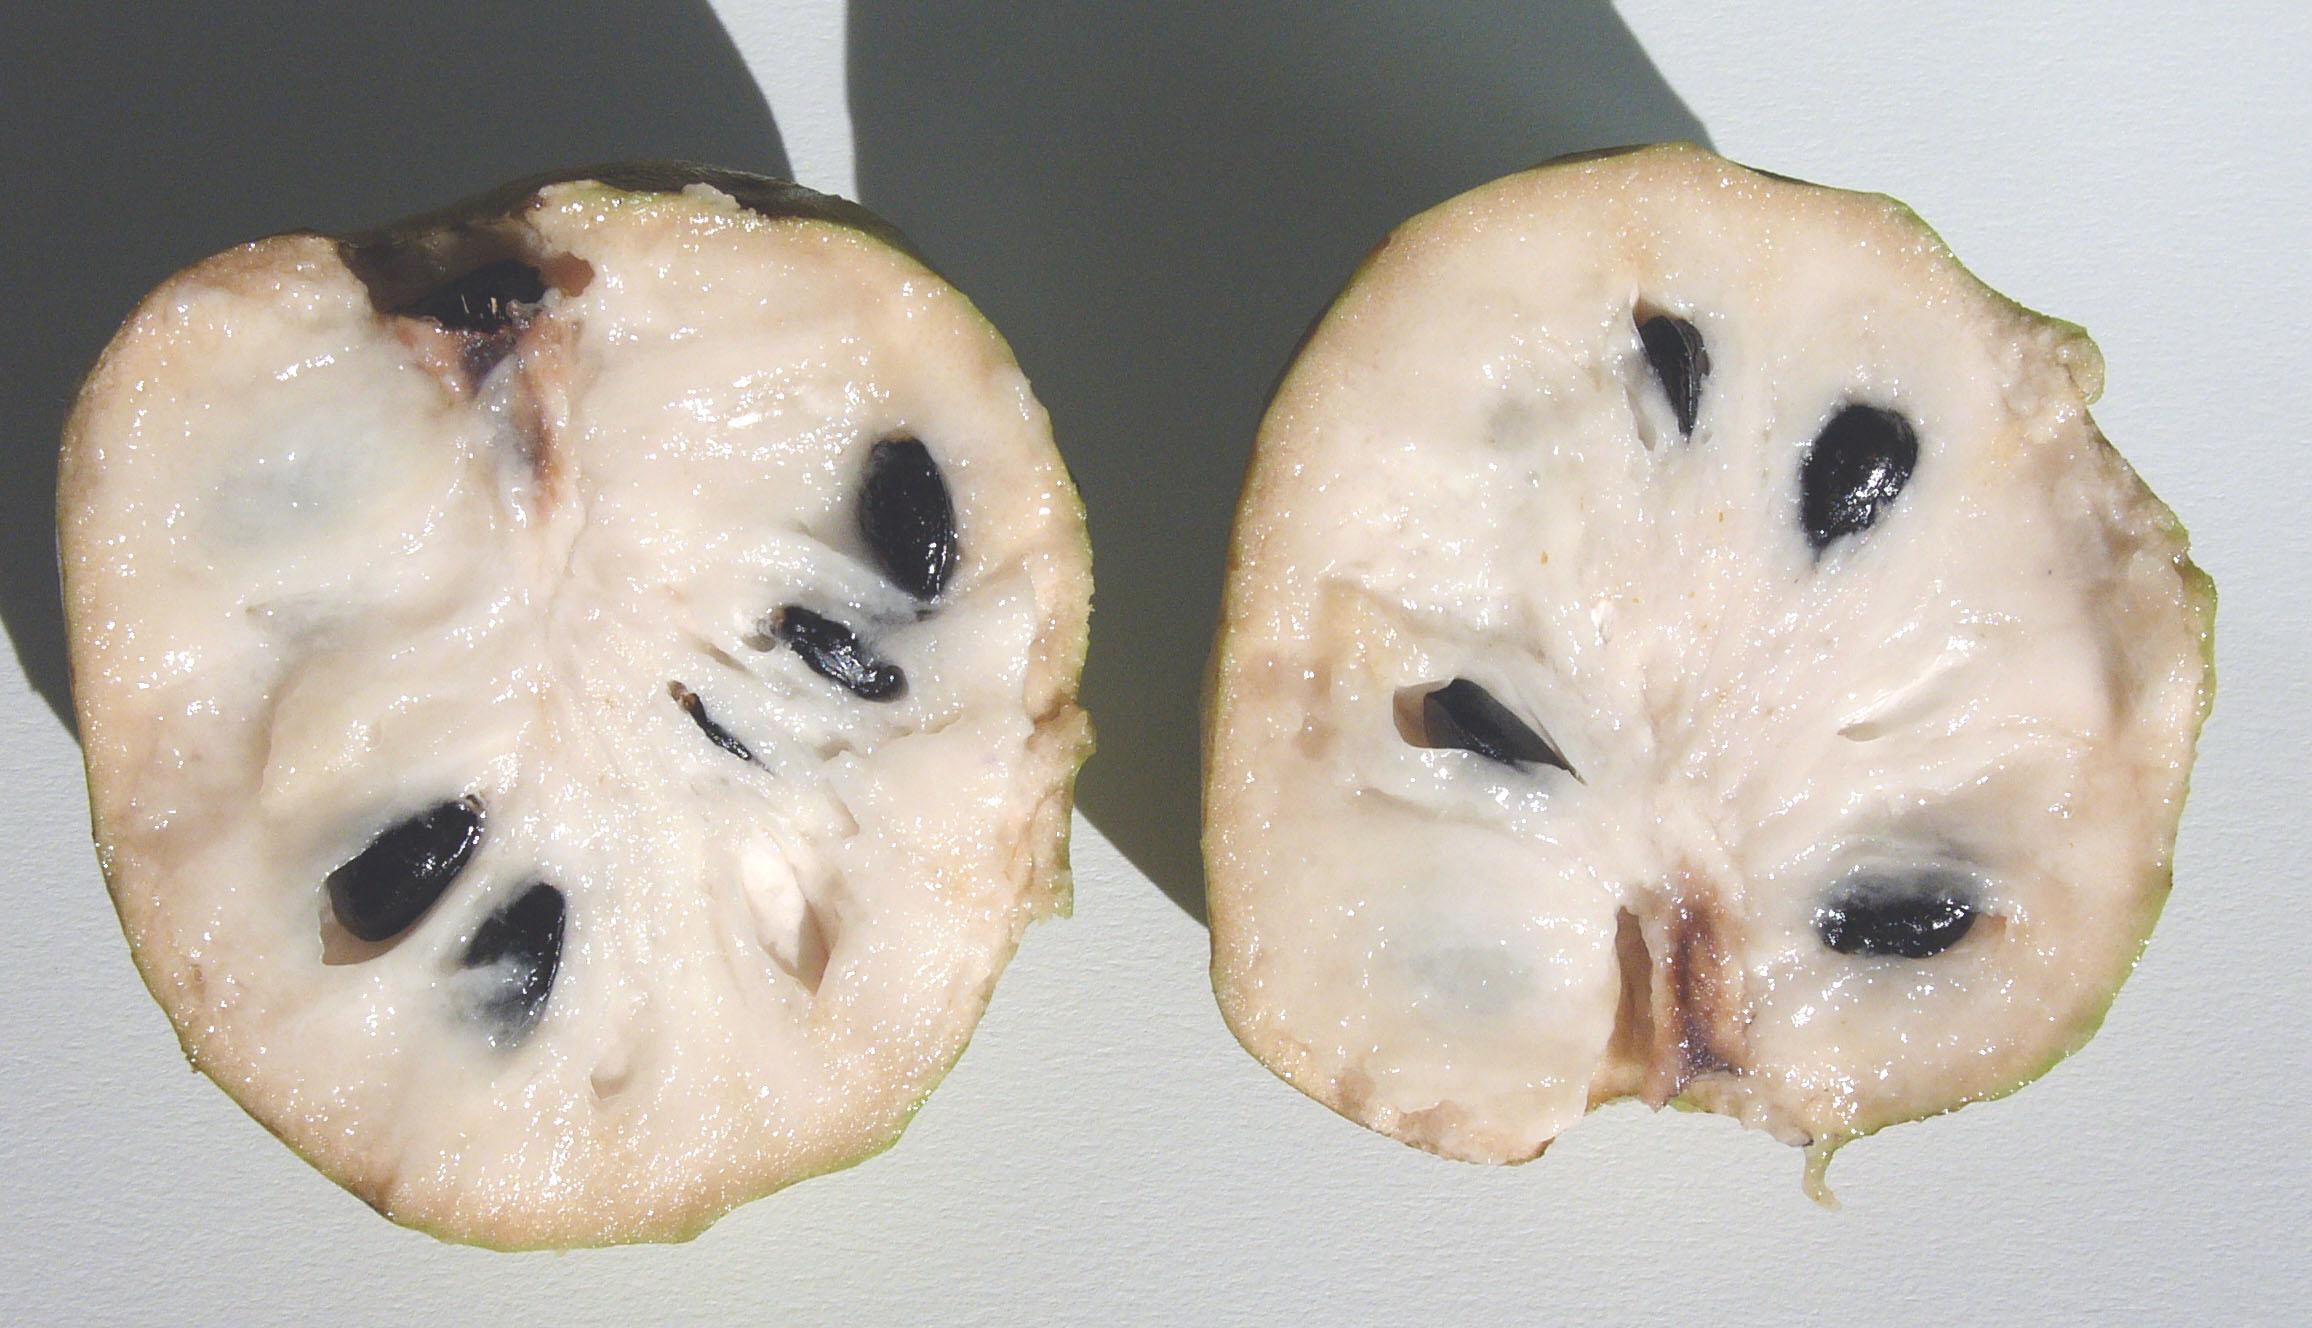 Cherimoya cut in half